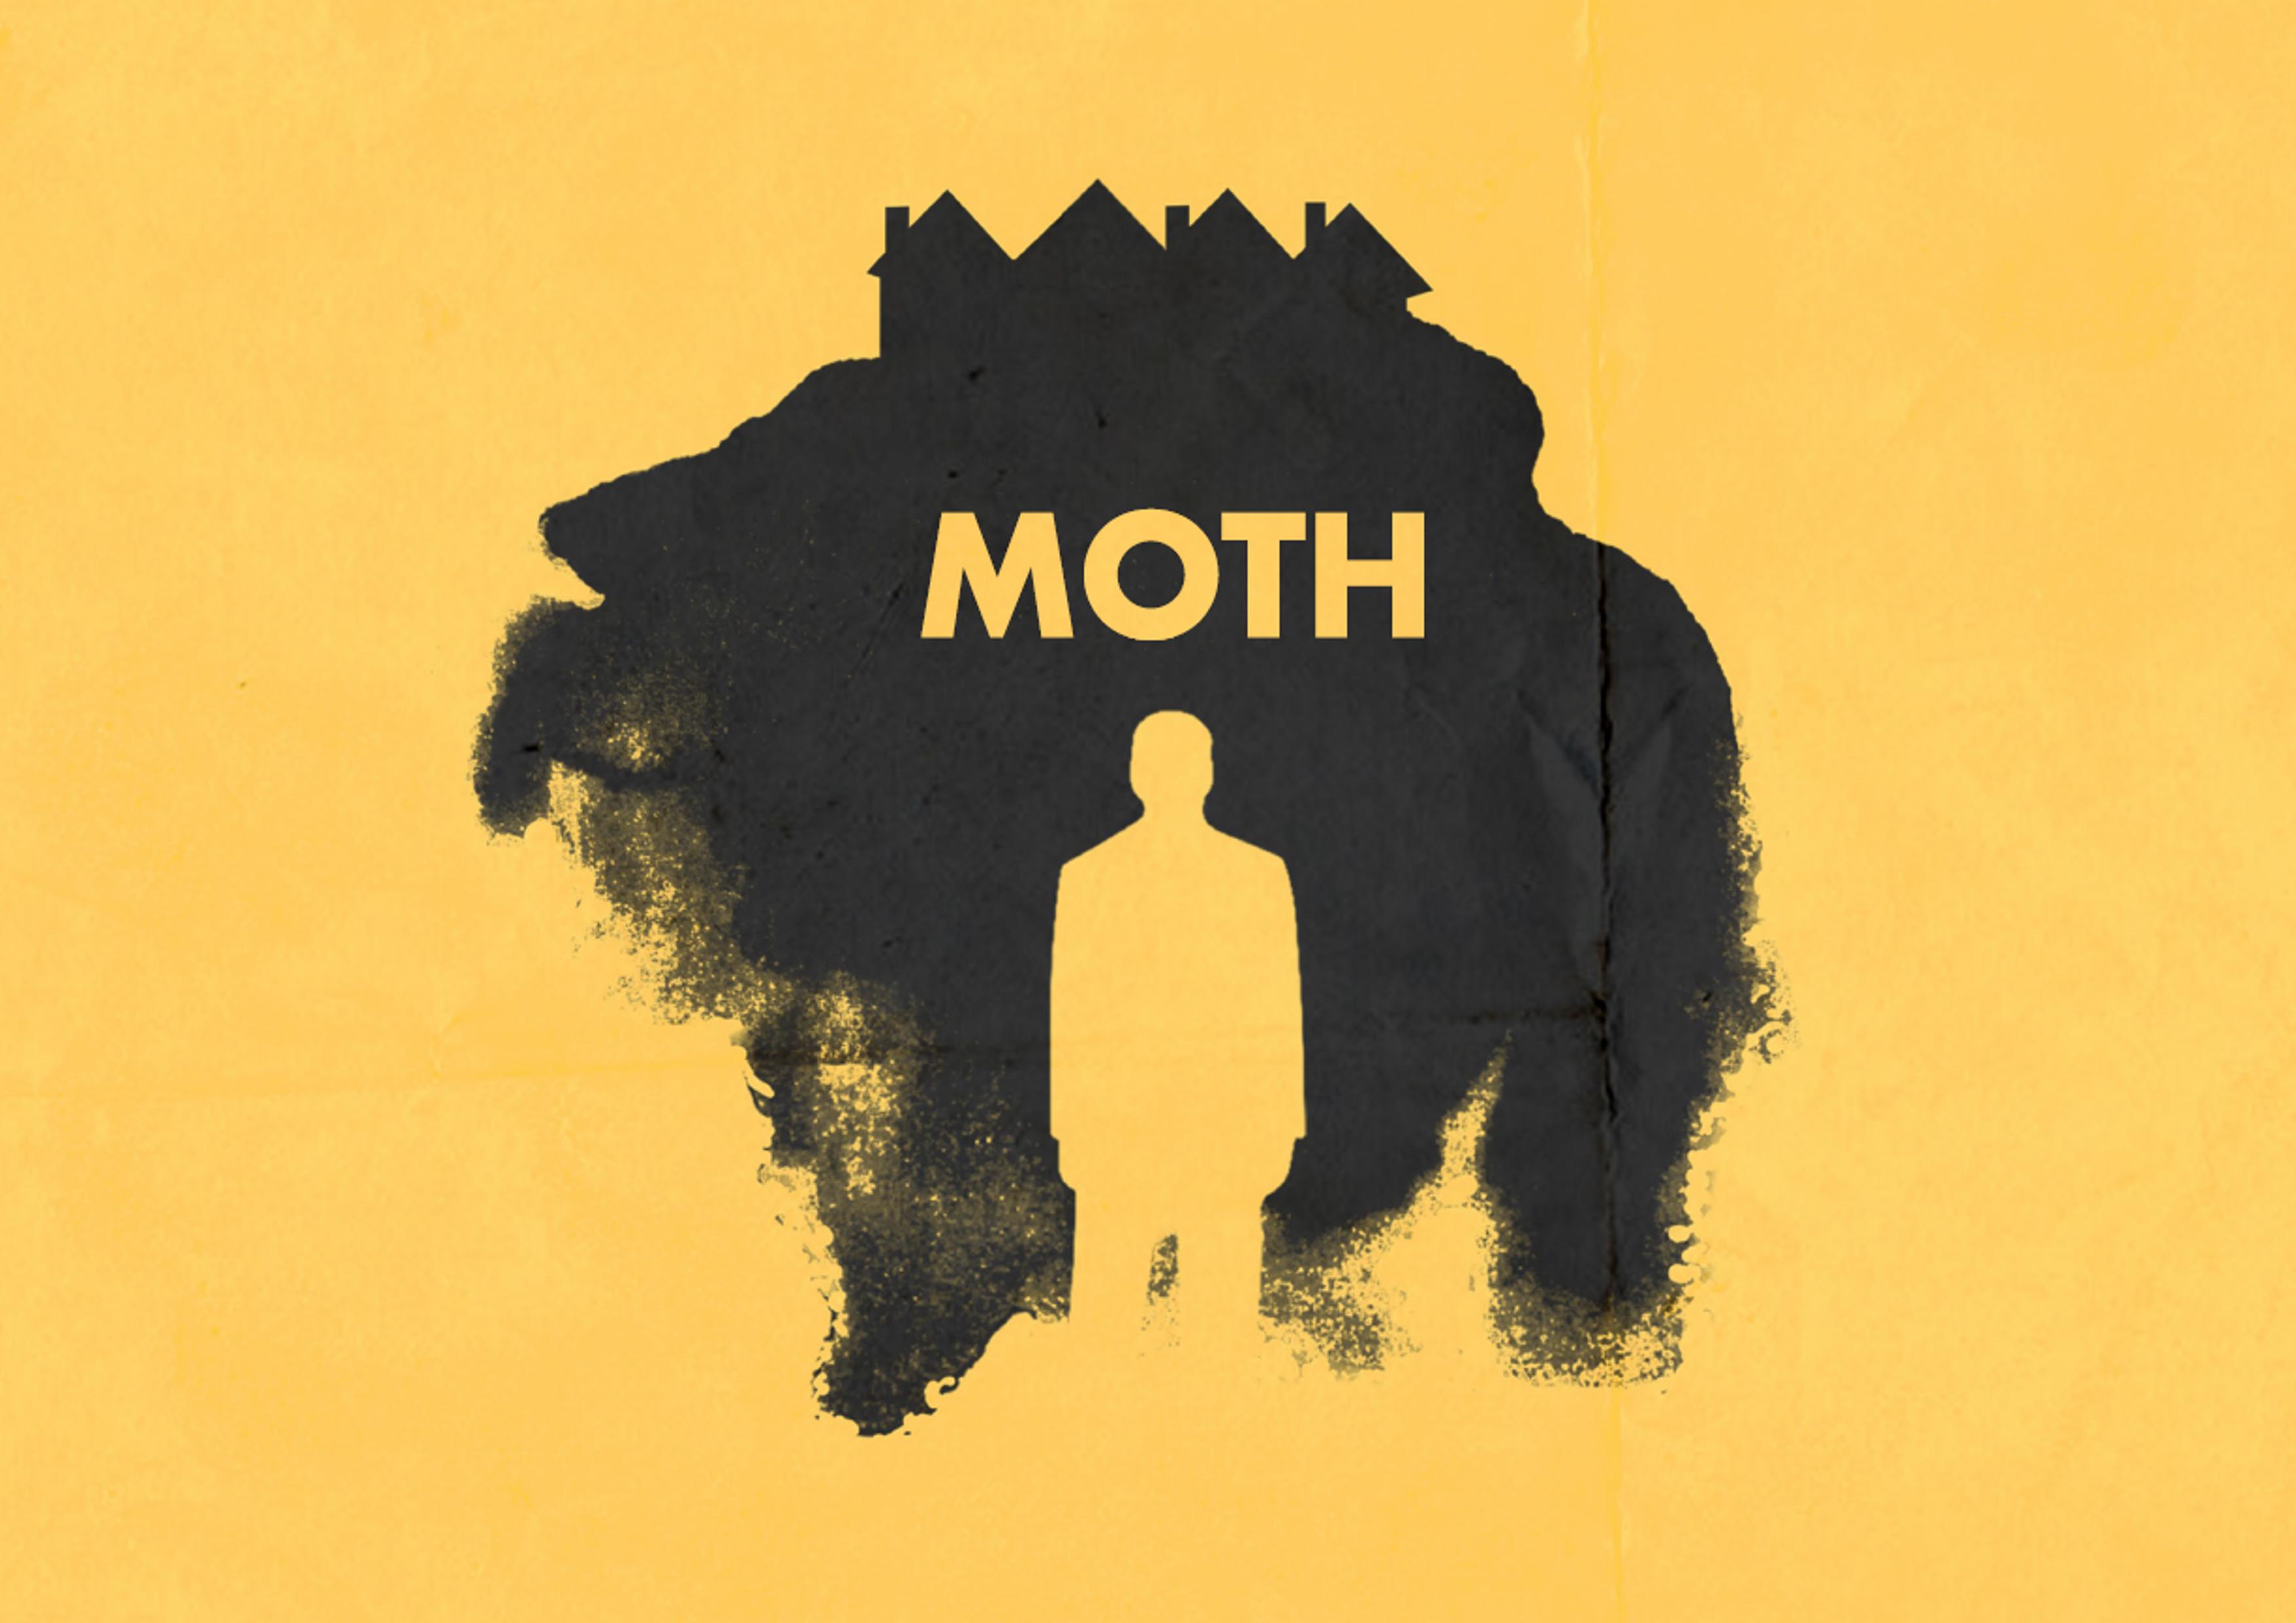 moth1.jpg#asset:488